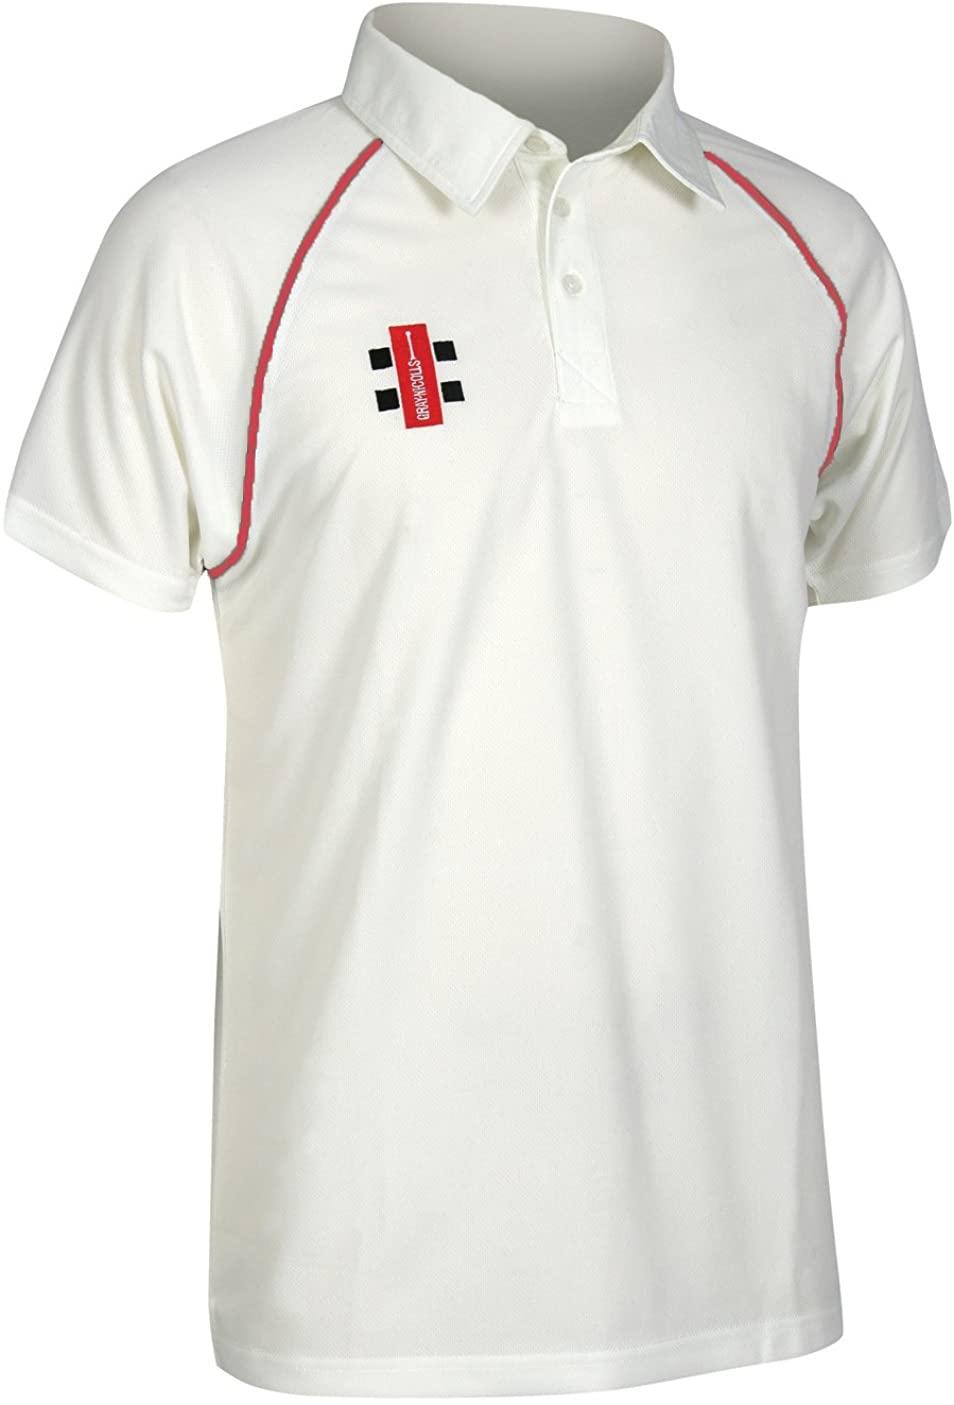 Gray Nicolls Childrens/Kids Matrix Short Sleeve Cricket Shirt